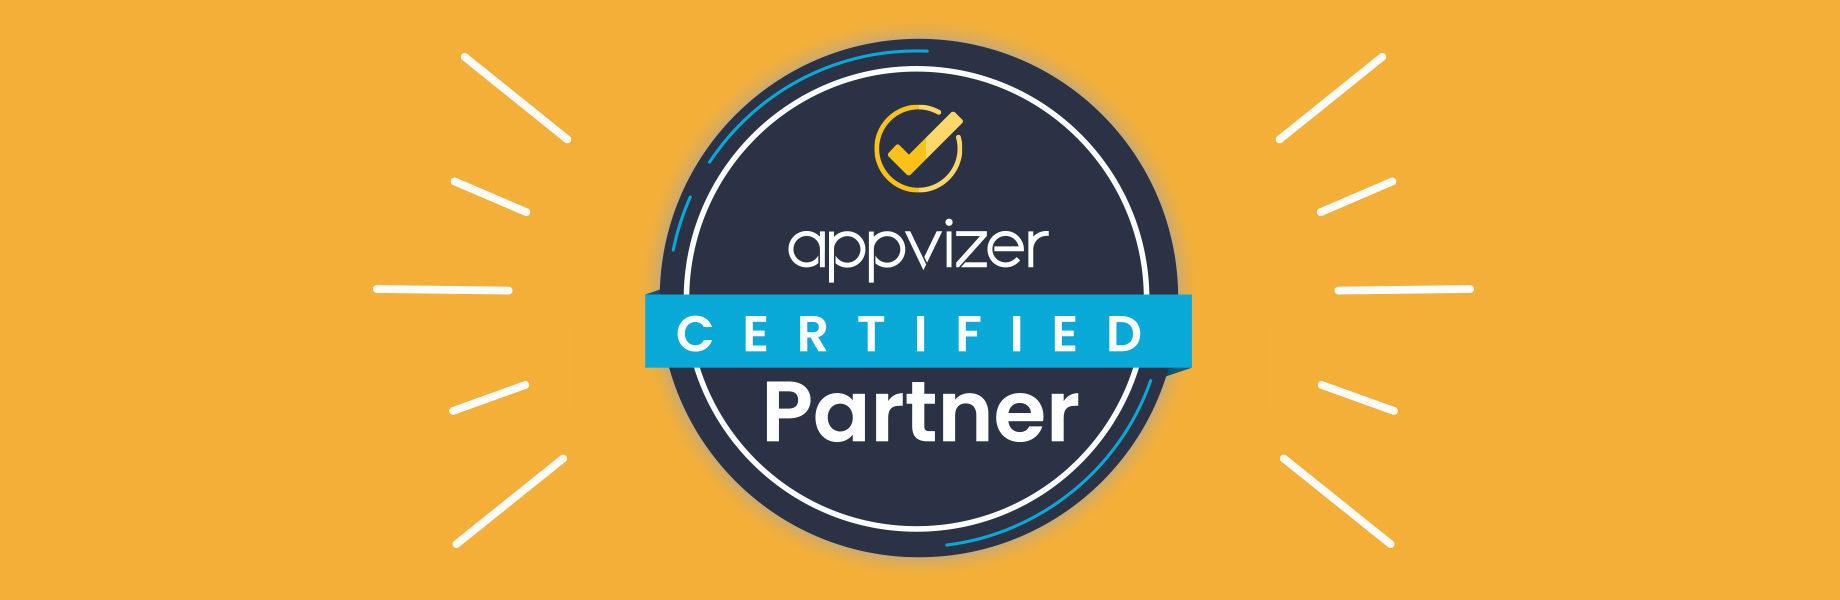 Perché un badge appvizer Certified Partner viene assegnato a un software?